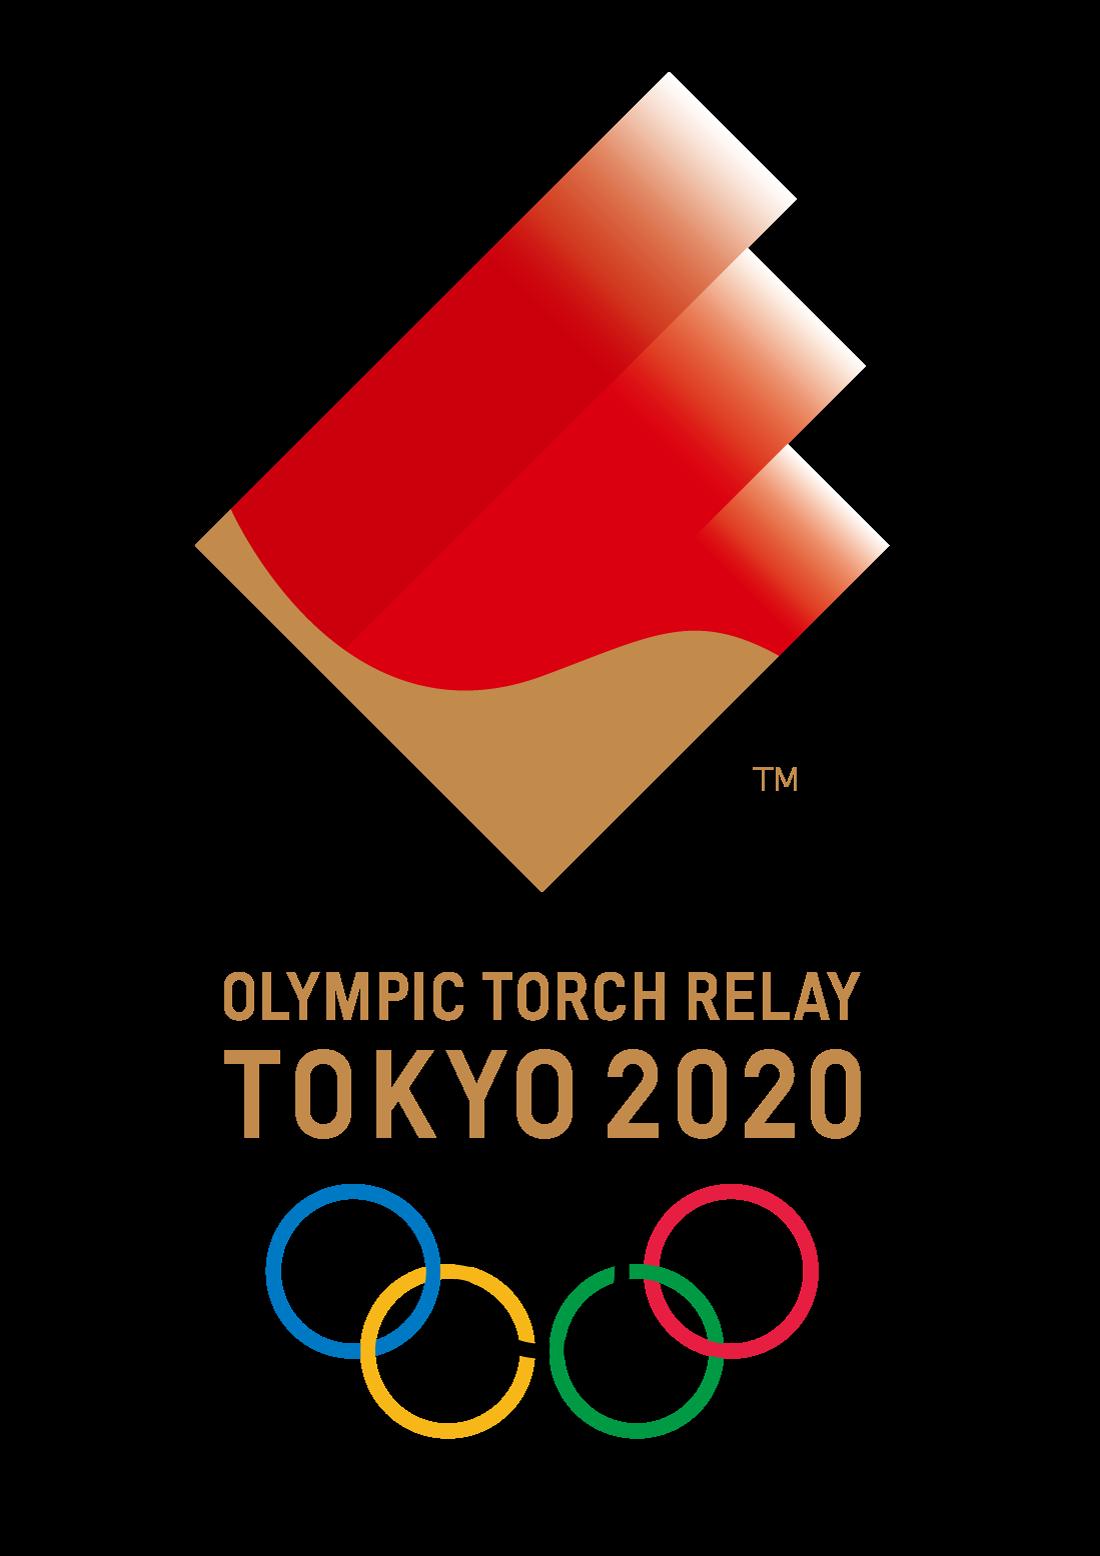 Tokyo 2020 Olympic Torch Relay brand design Tokyo 2020